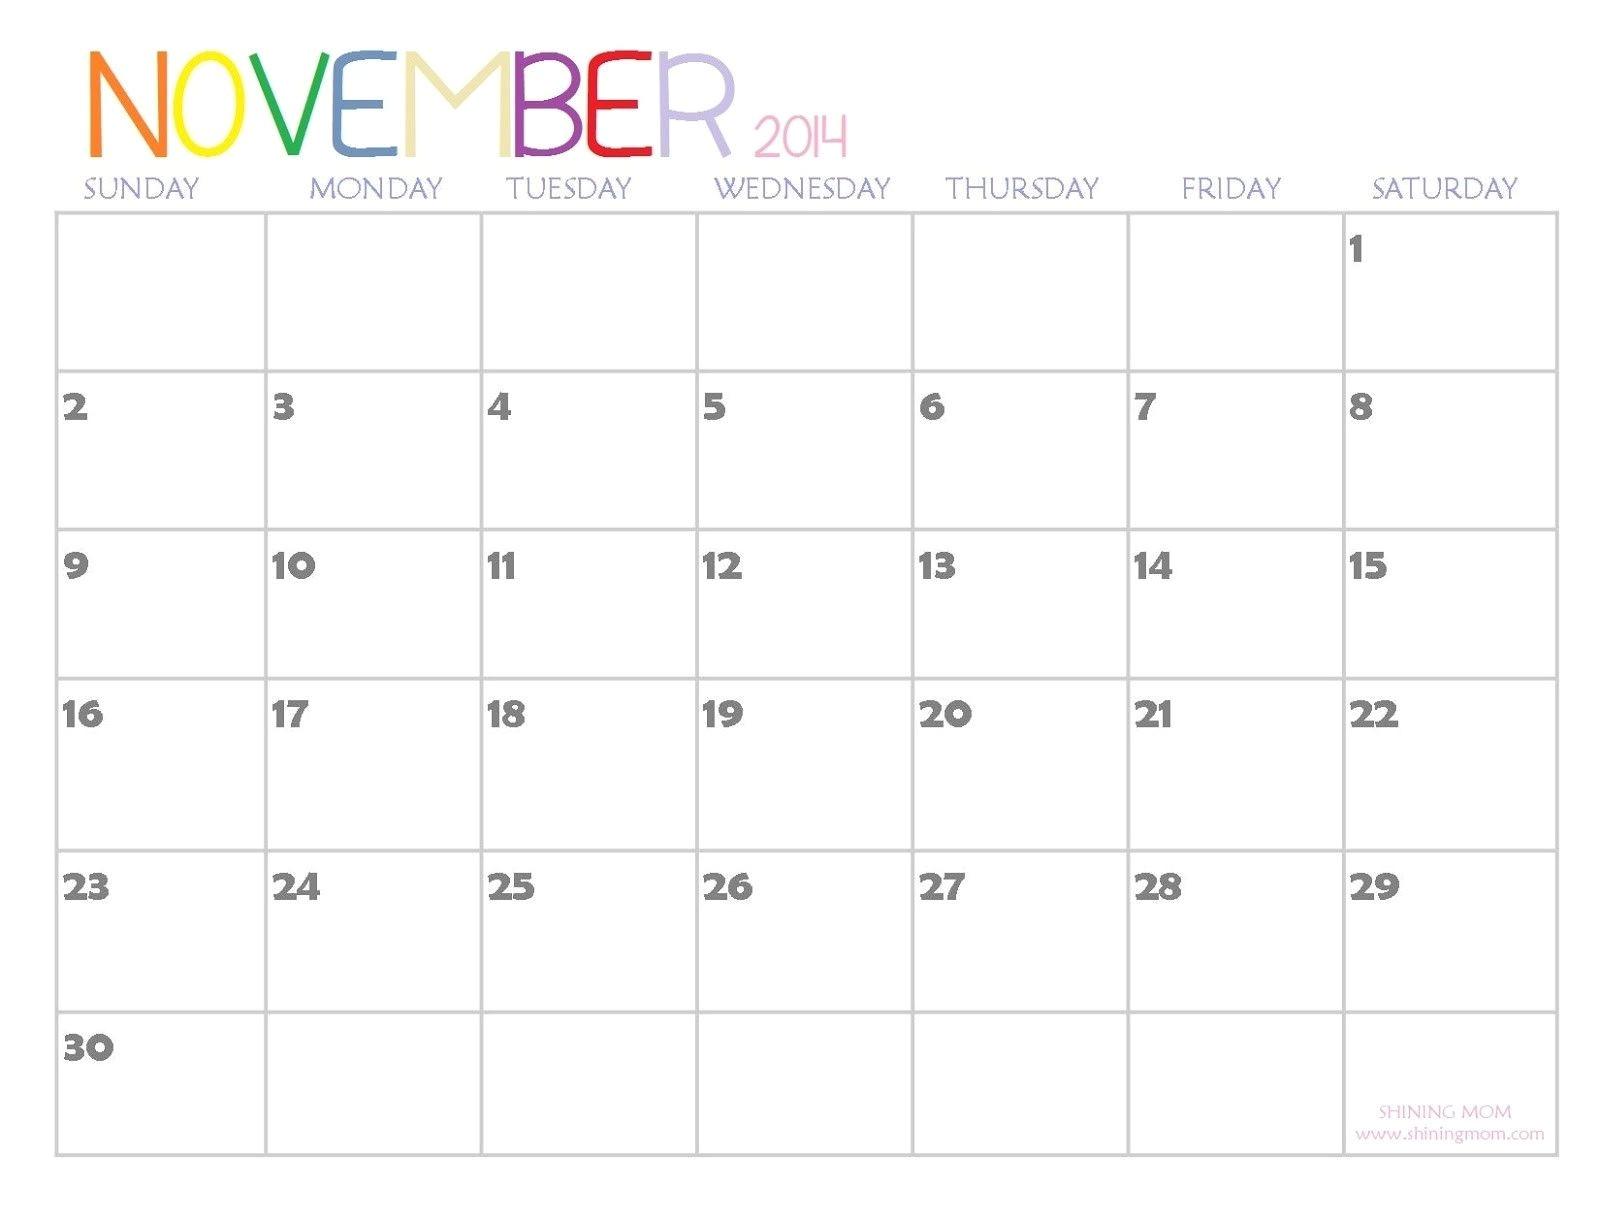 Blank Calendar Template November 2014 November 2014 Printable Calendar Freepsychiclovereadings Com